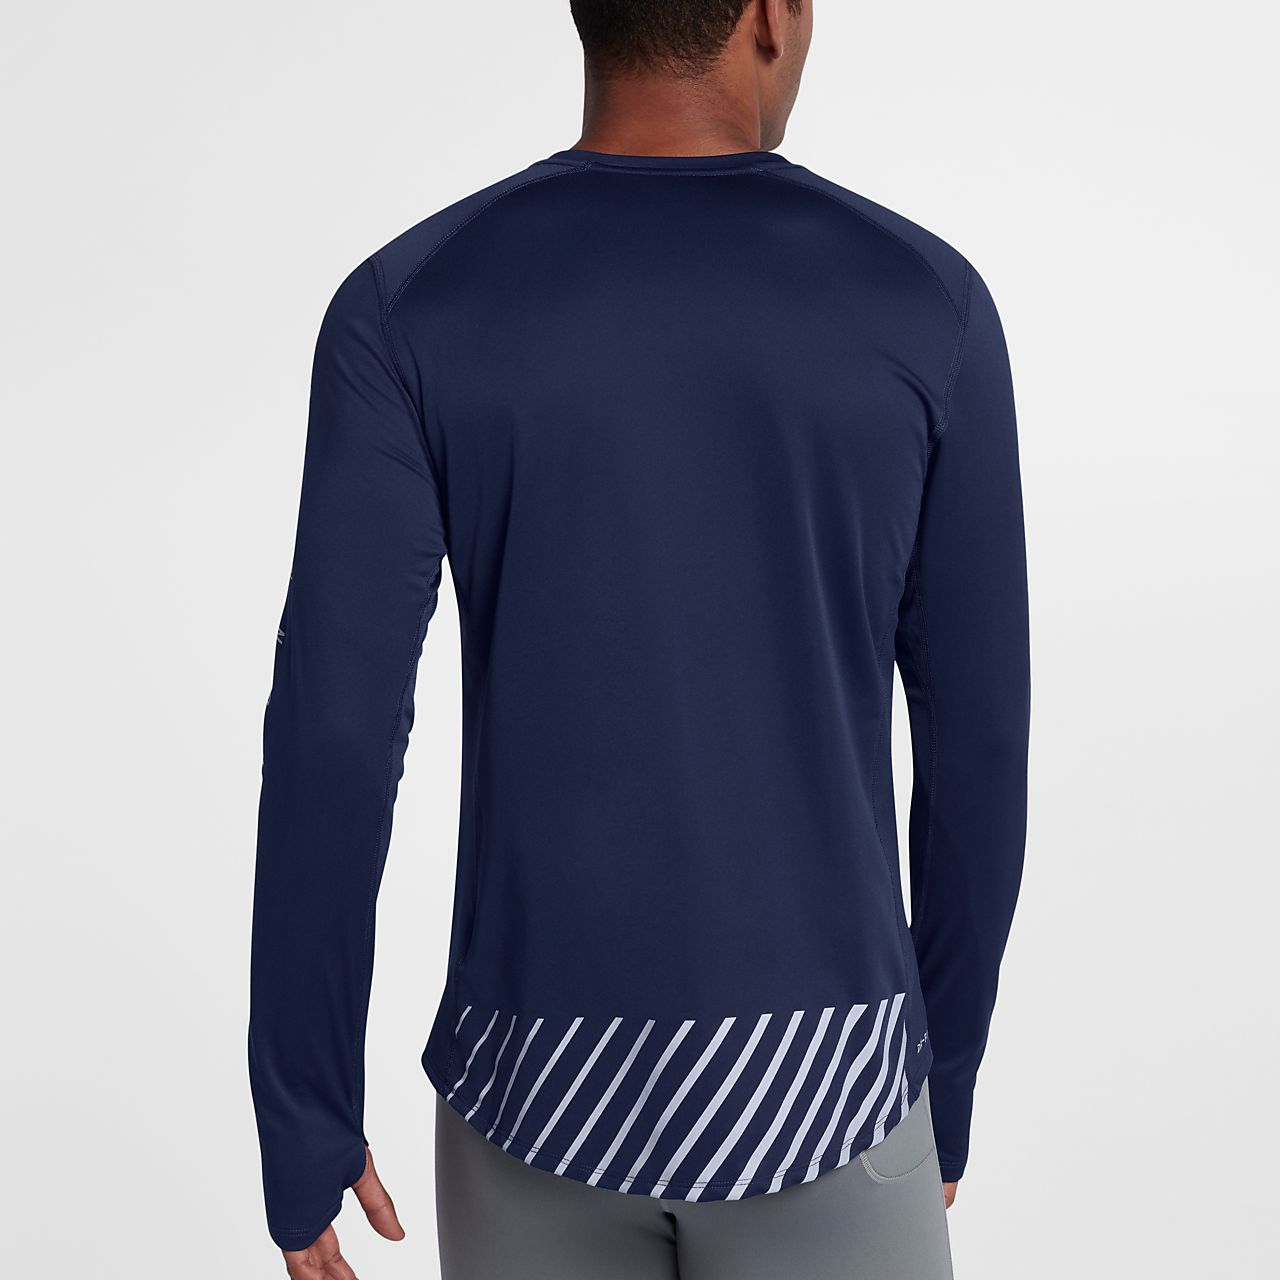 a3383a06df1f Nike Miler Long Sleeve Running Shirt - BCD Tofu House